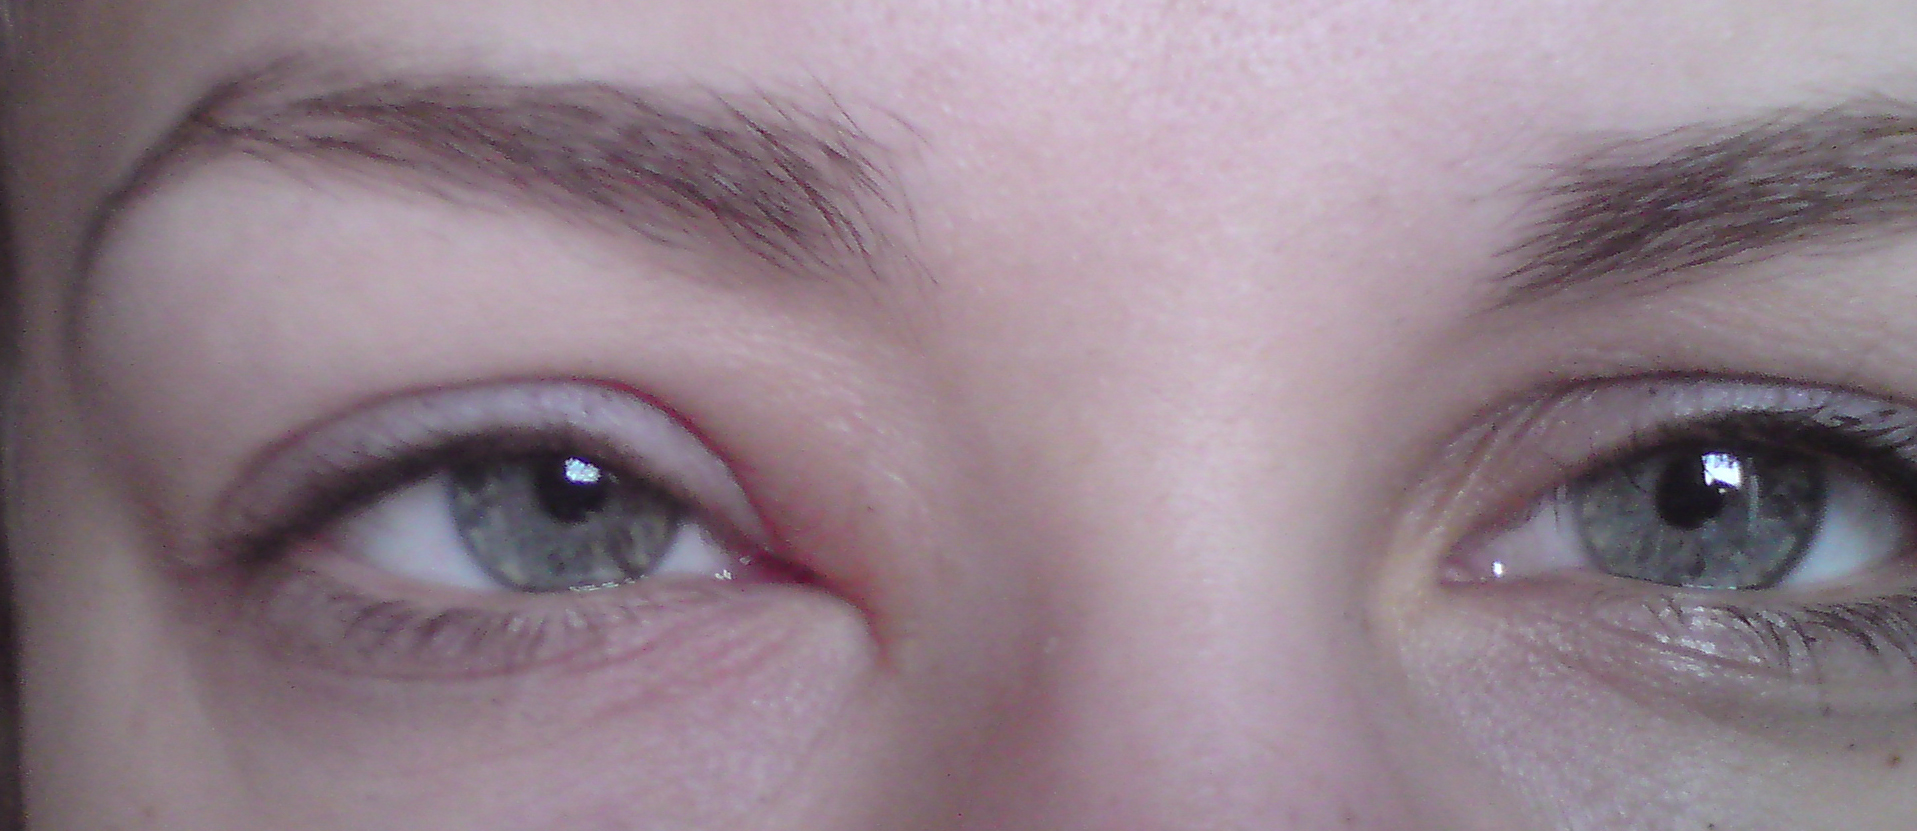 bihåleinflammation röda ögon